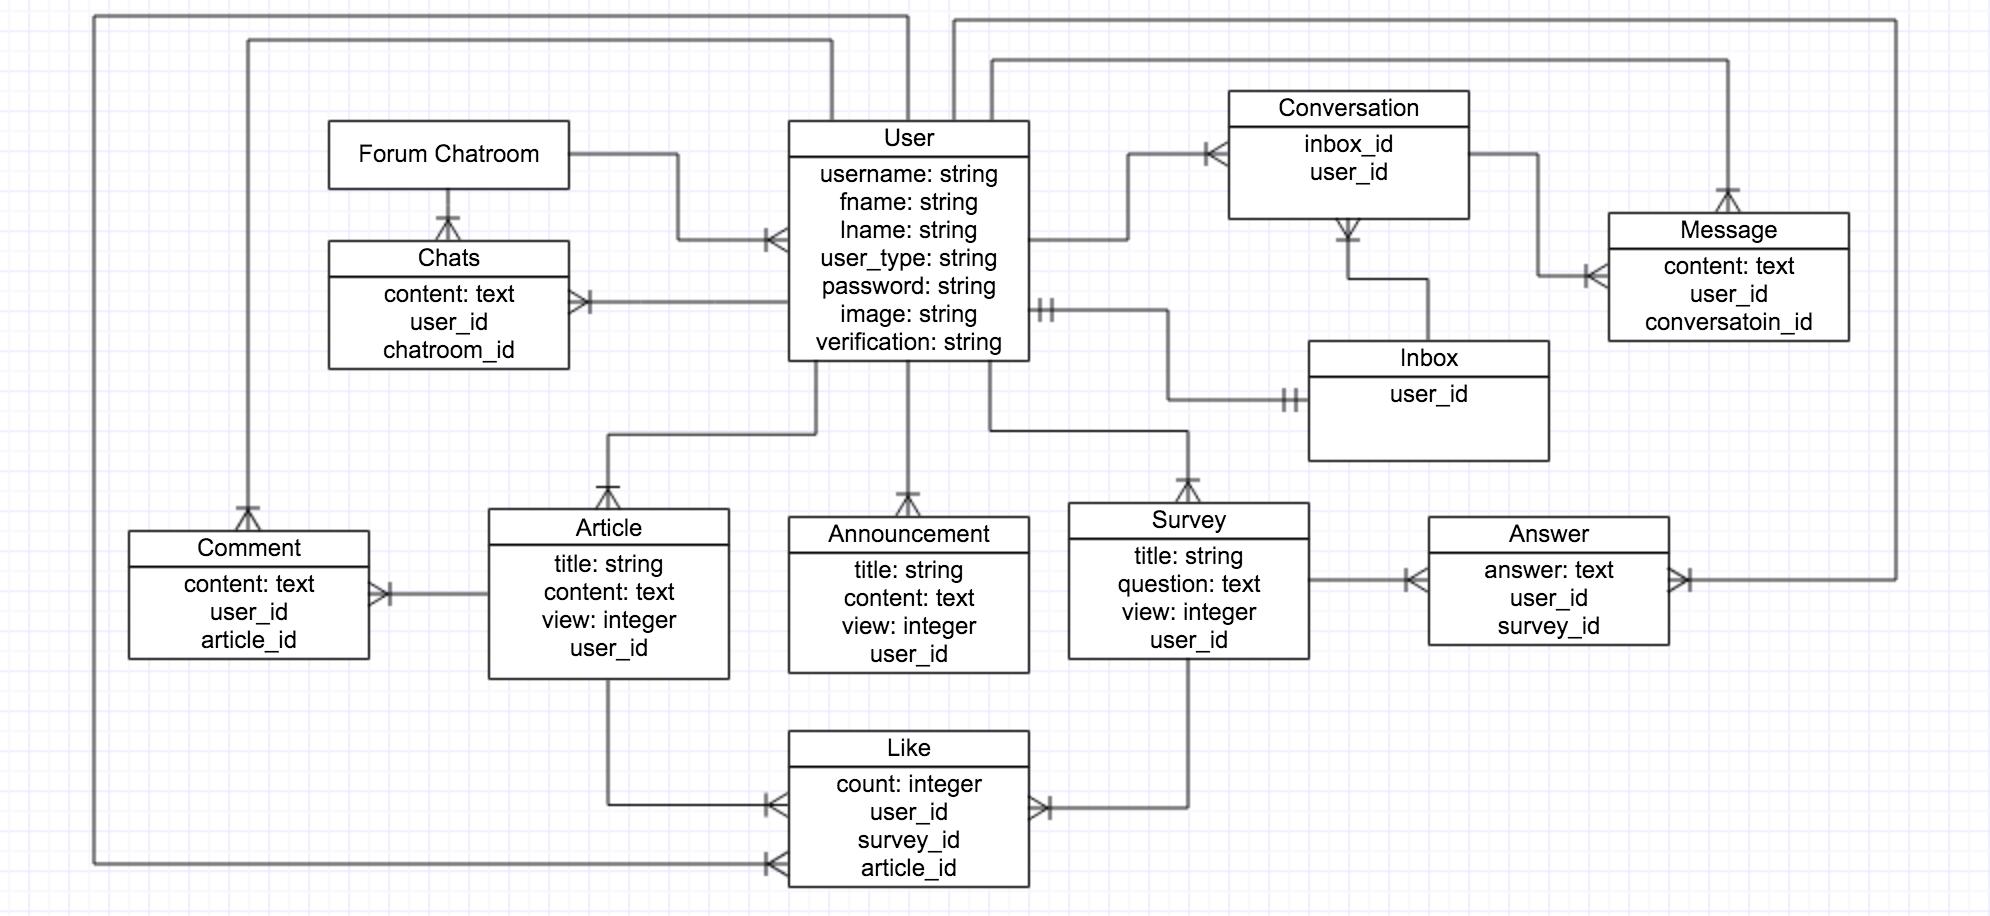 Github - Llovee91/wdiforum: Project 2: Forum Built Using